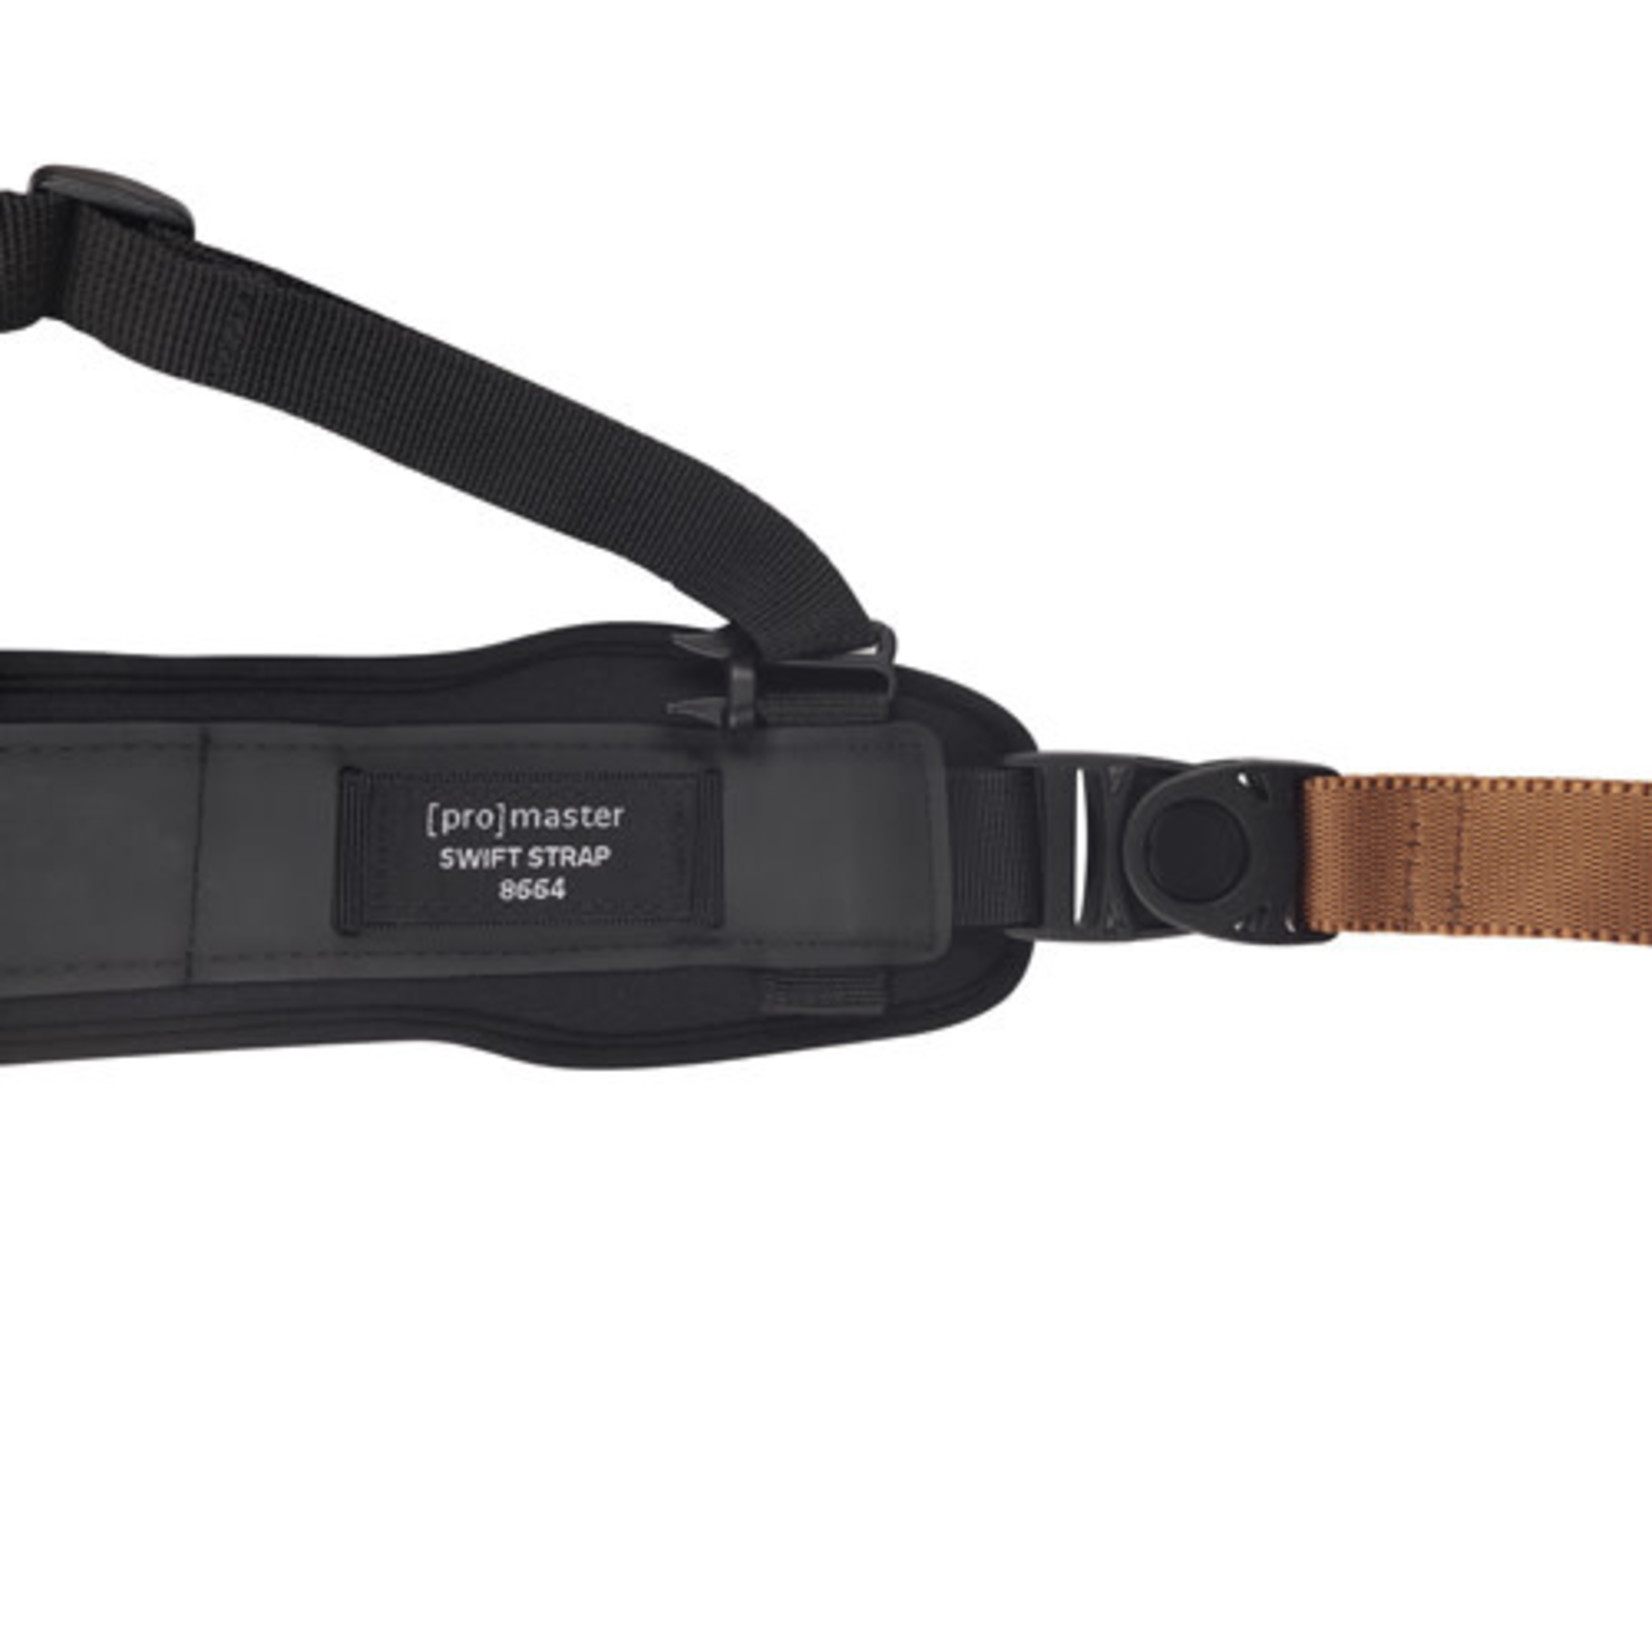 ProMaster Swift Strap 2 HD - Brown